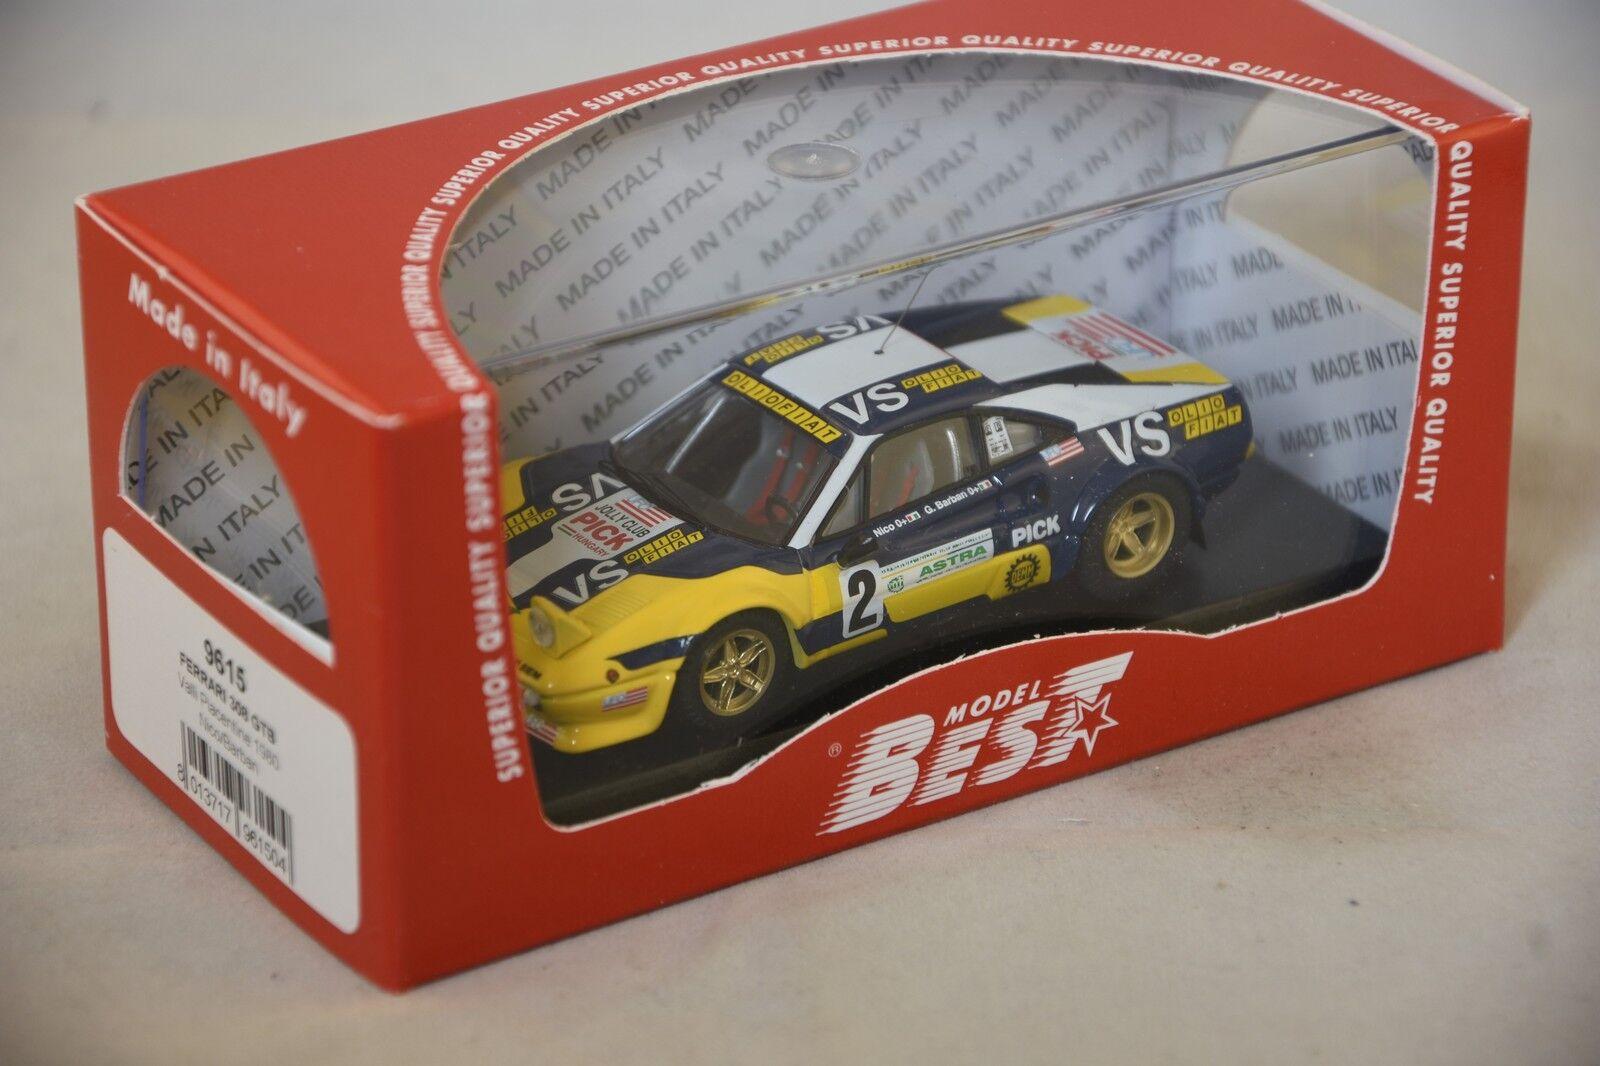 Best MODEL 9615 - Ferrari 308 GTB Gr.4 #2 rallye Valli Piacentine - 1980  1/43 | Les Clients D'abord